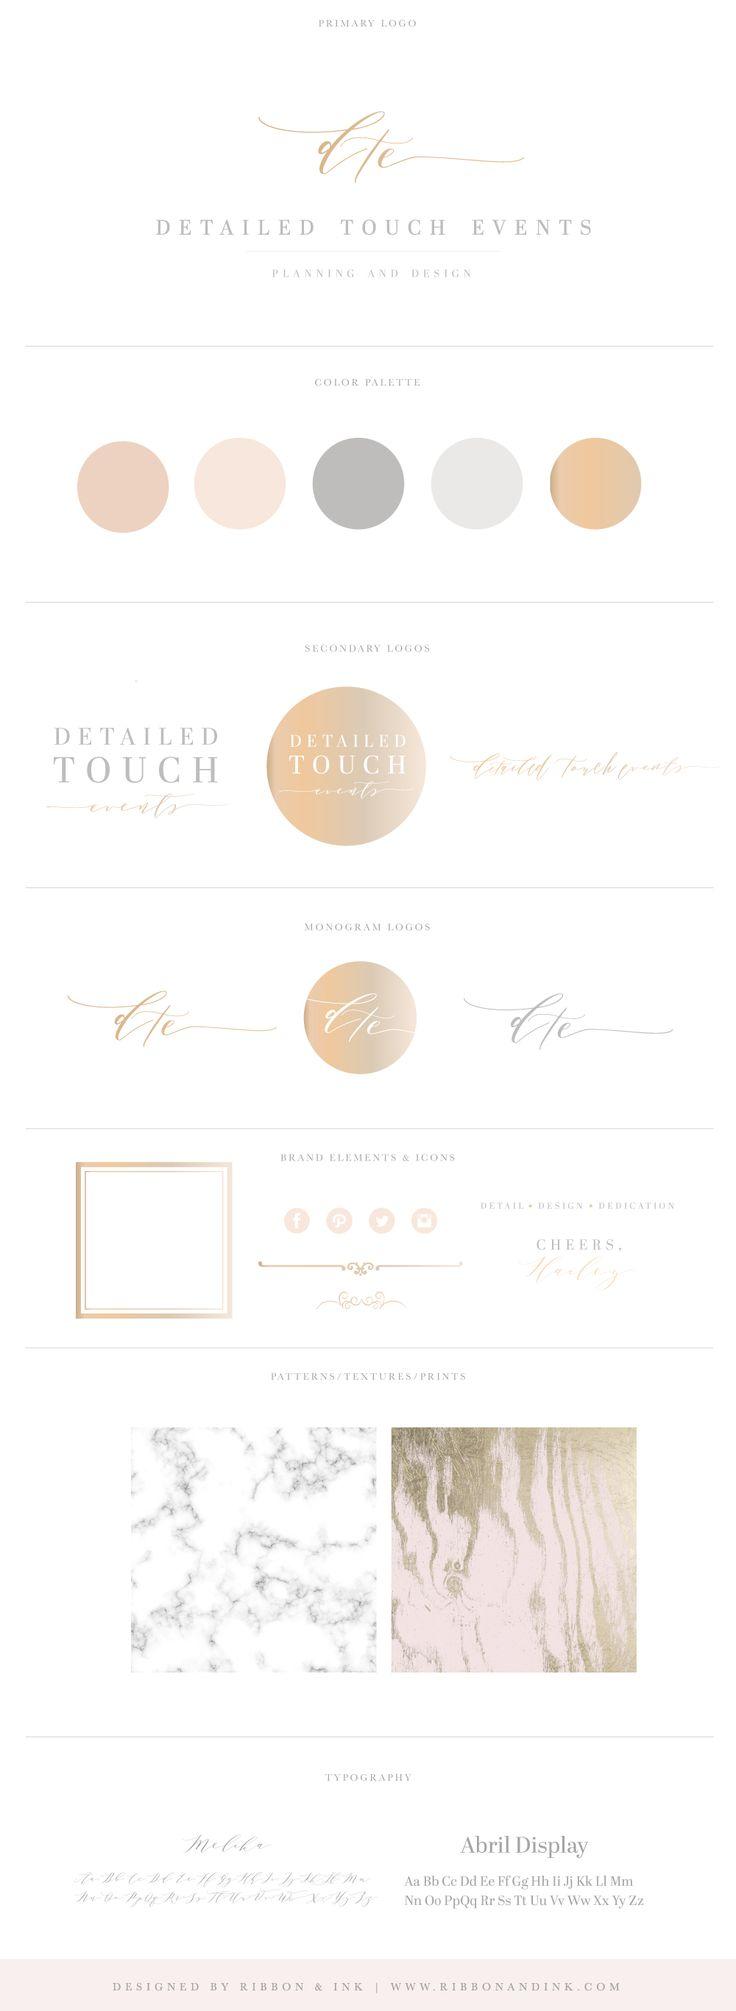 Branding / Web design / website / photographer website / custom website / website ideas/ website inspiration / Brand board / brand design / custom logo / photographer brand / photographer logo / color palette / logo design / rebrand